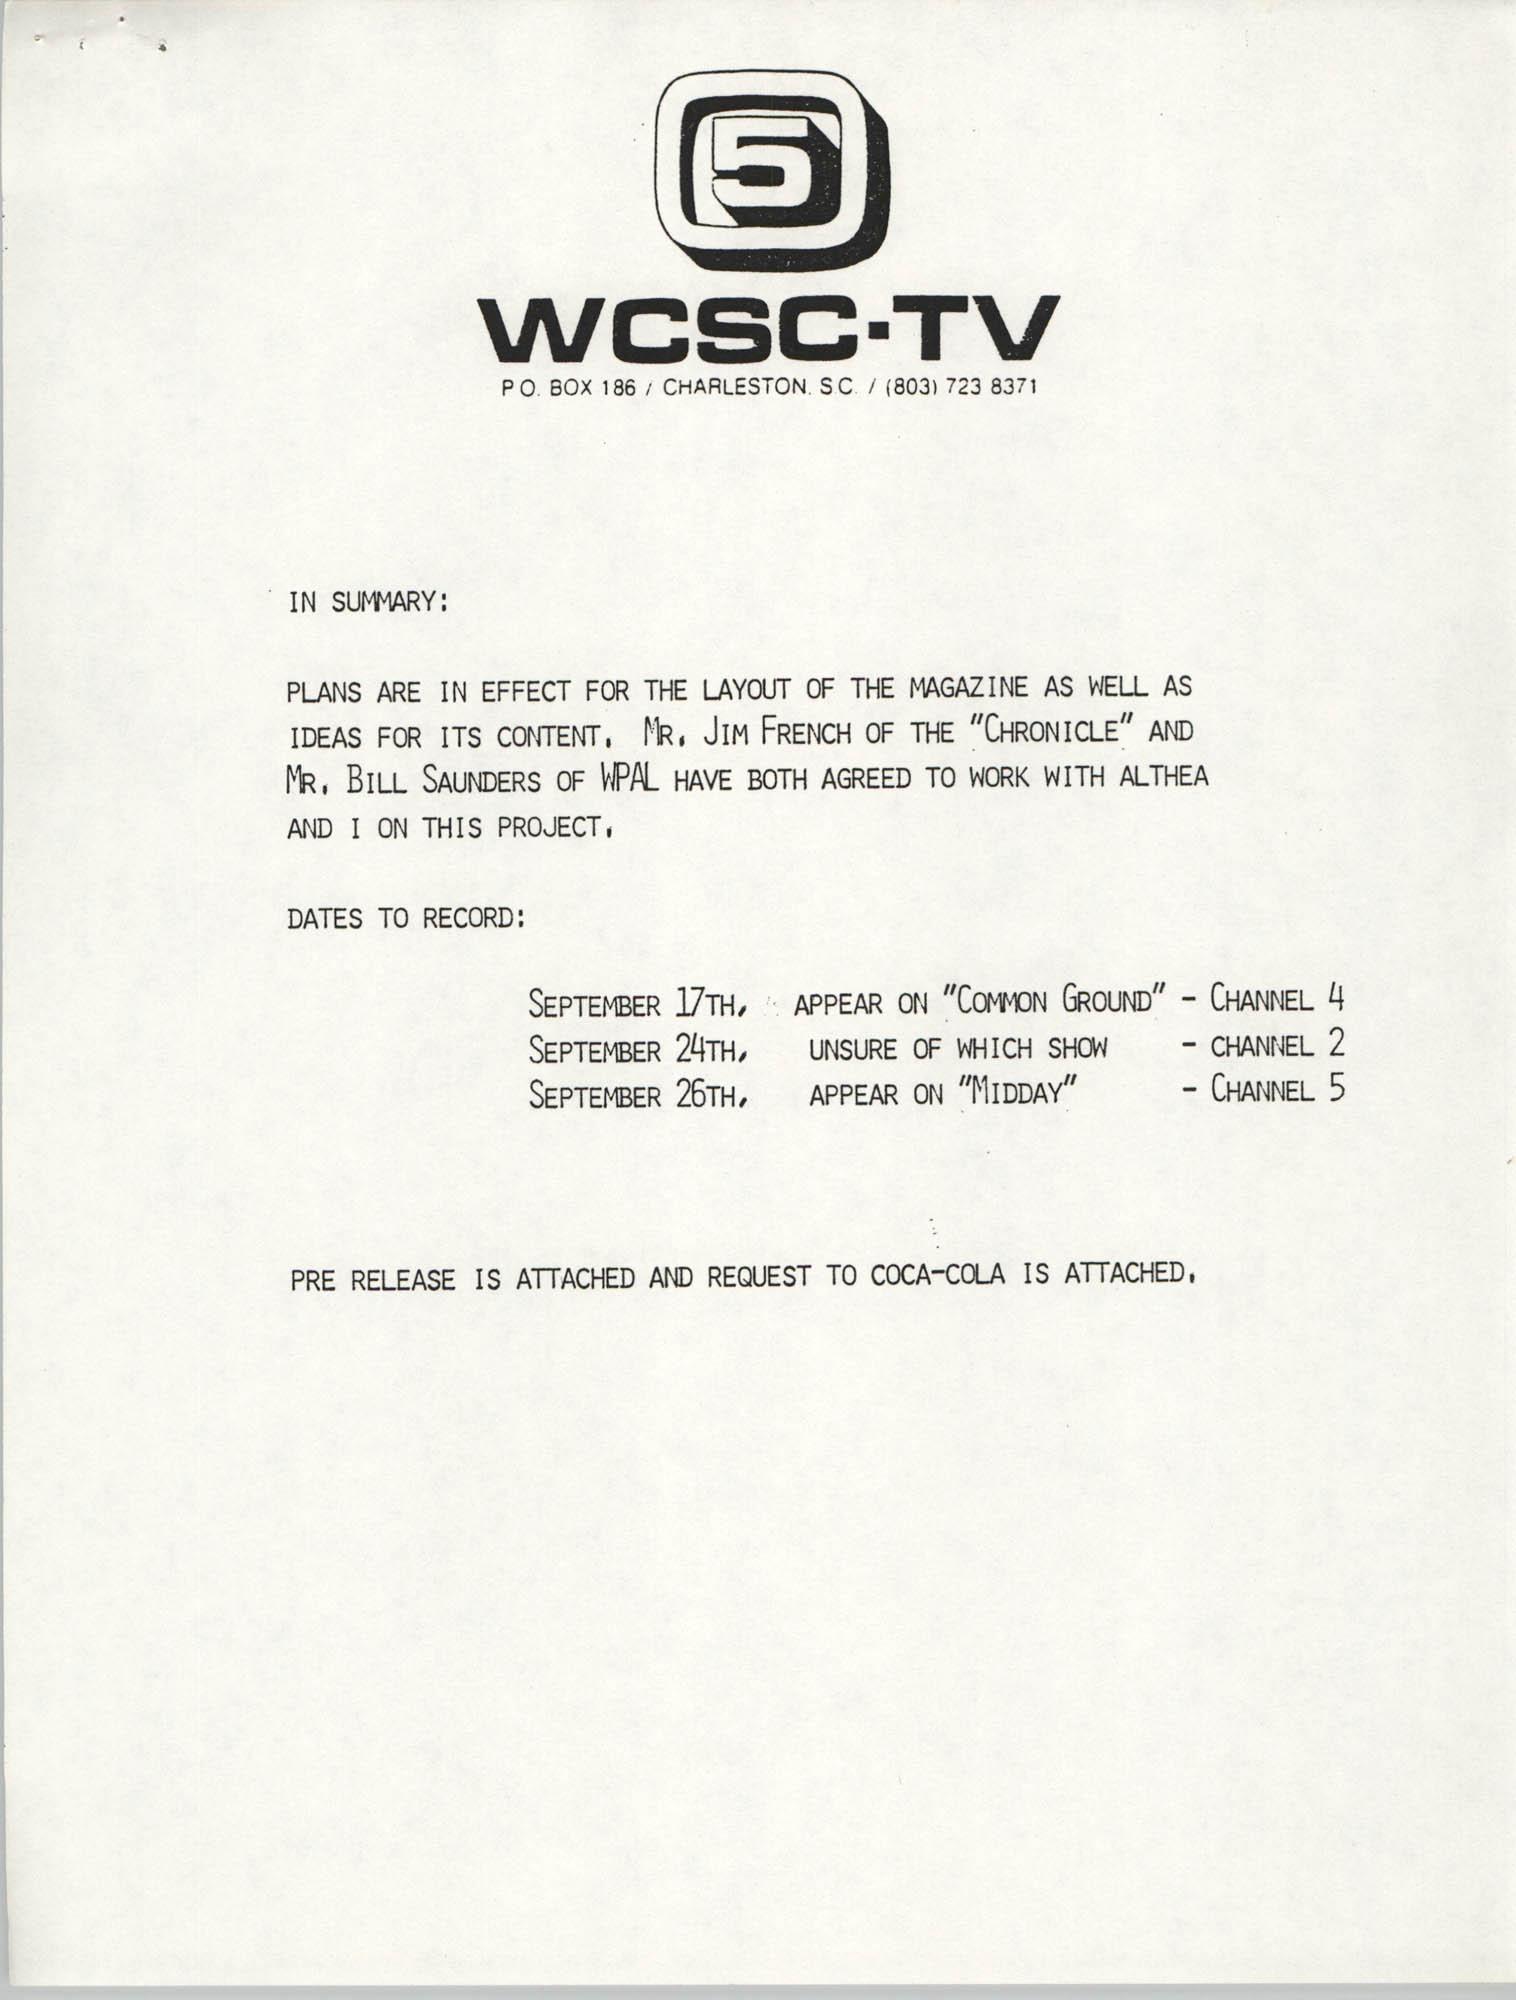 Notification, WCSC-TV 5